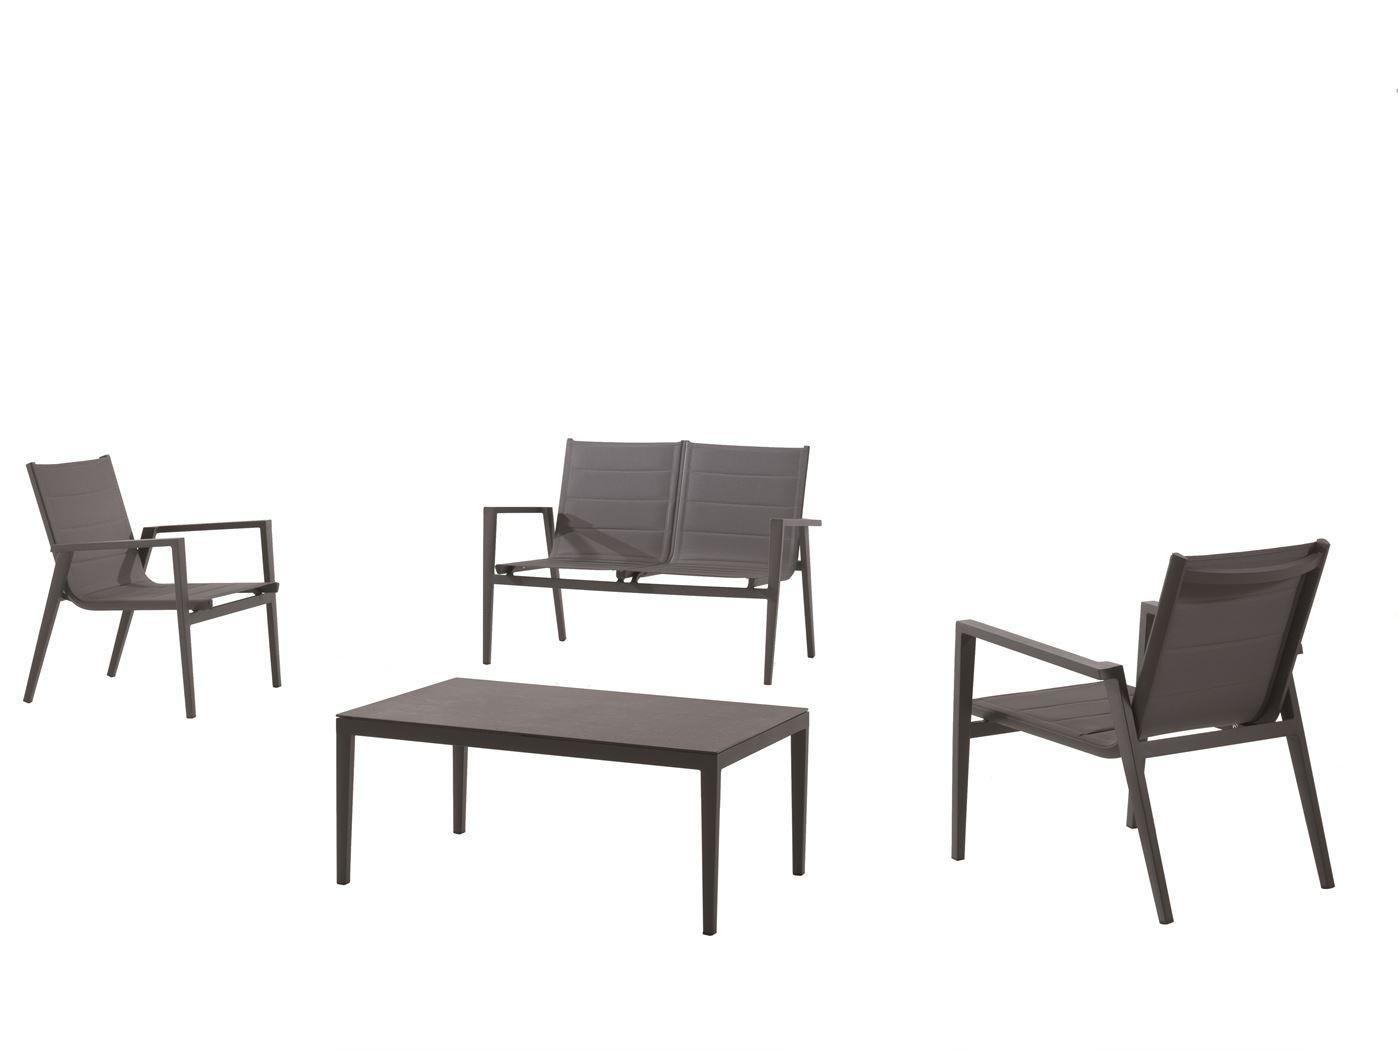 gescova kona lounge set alu charcoal textylene silver grey